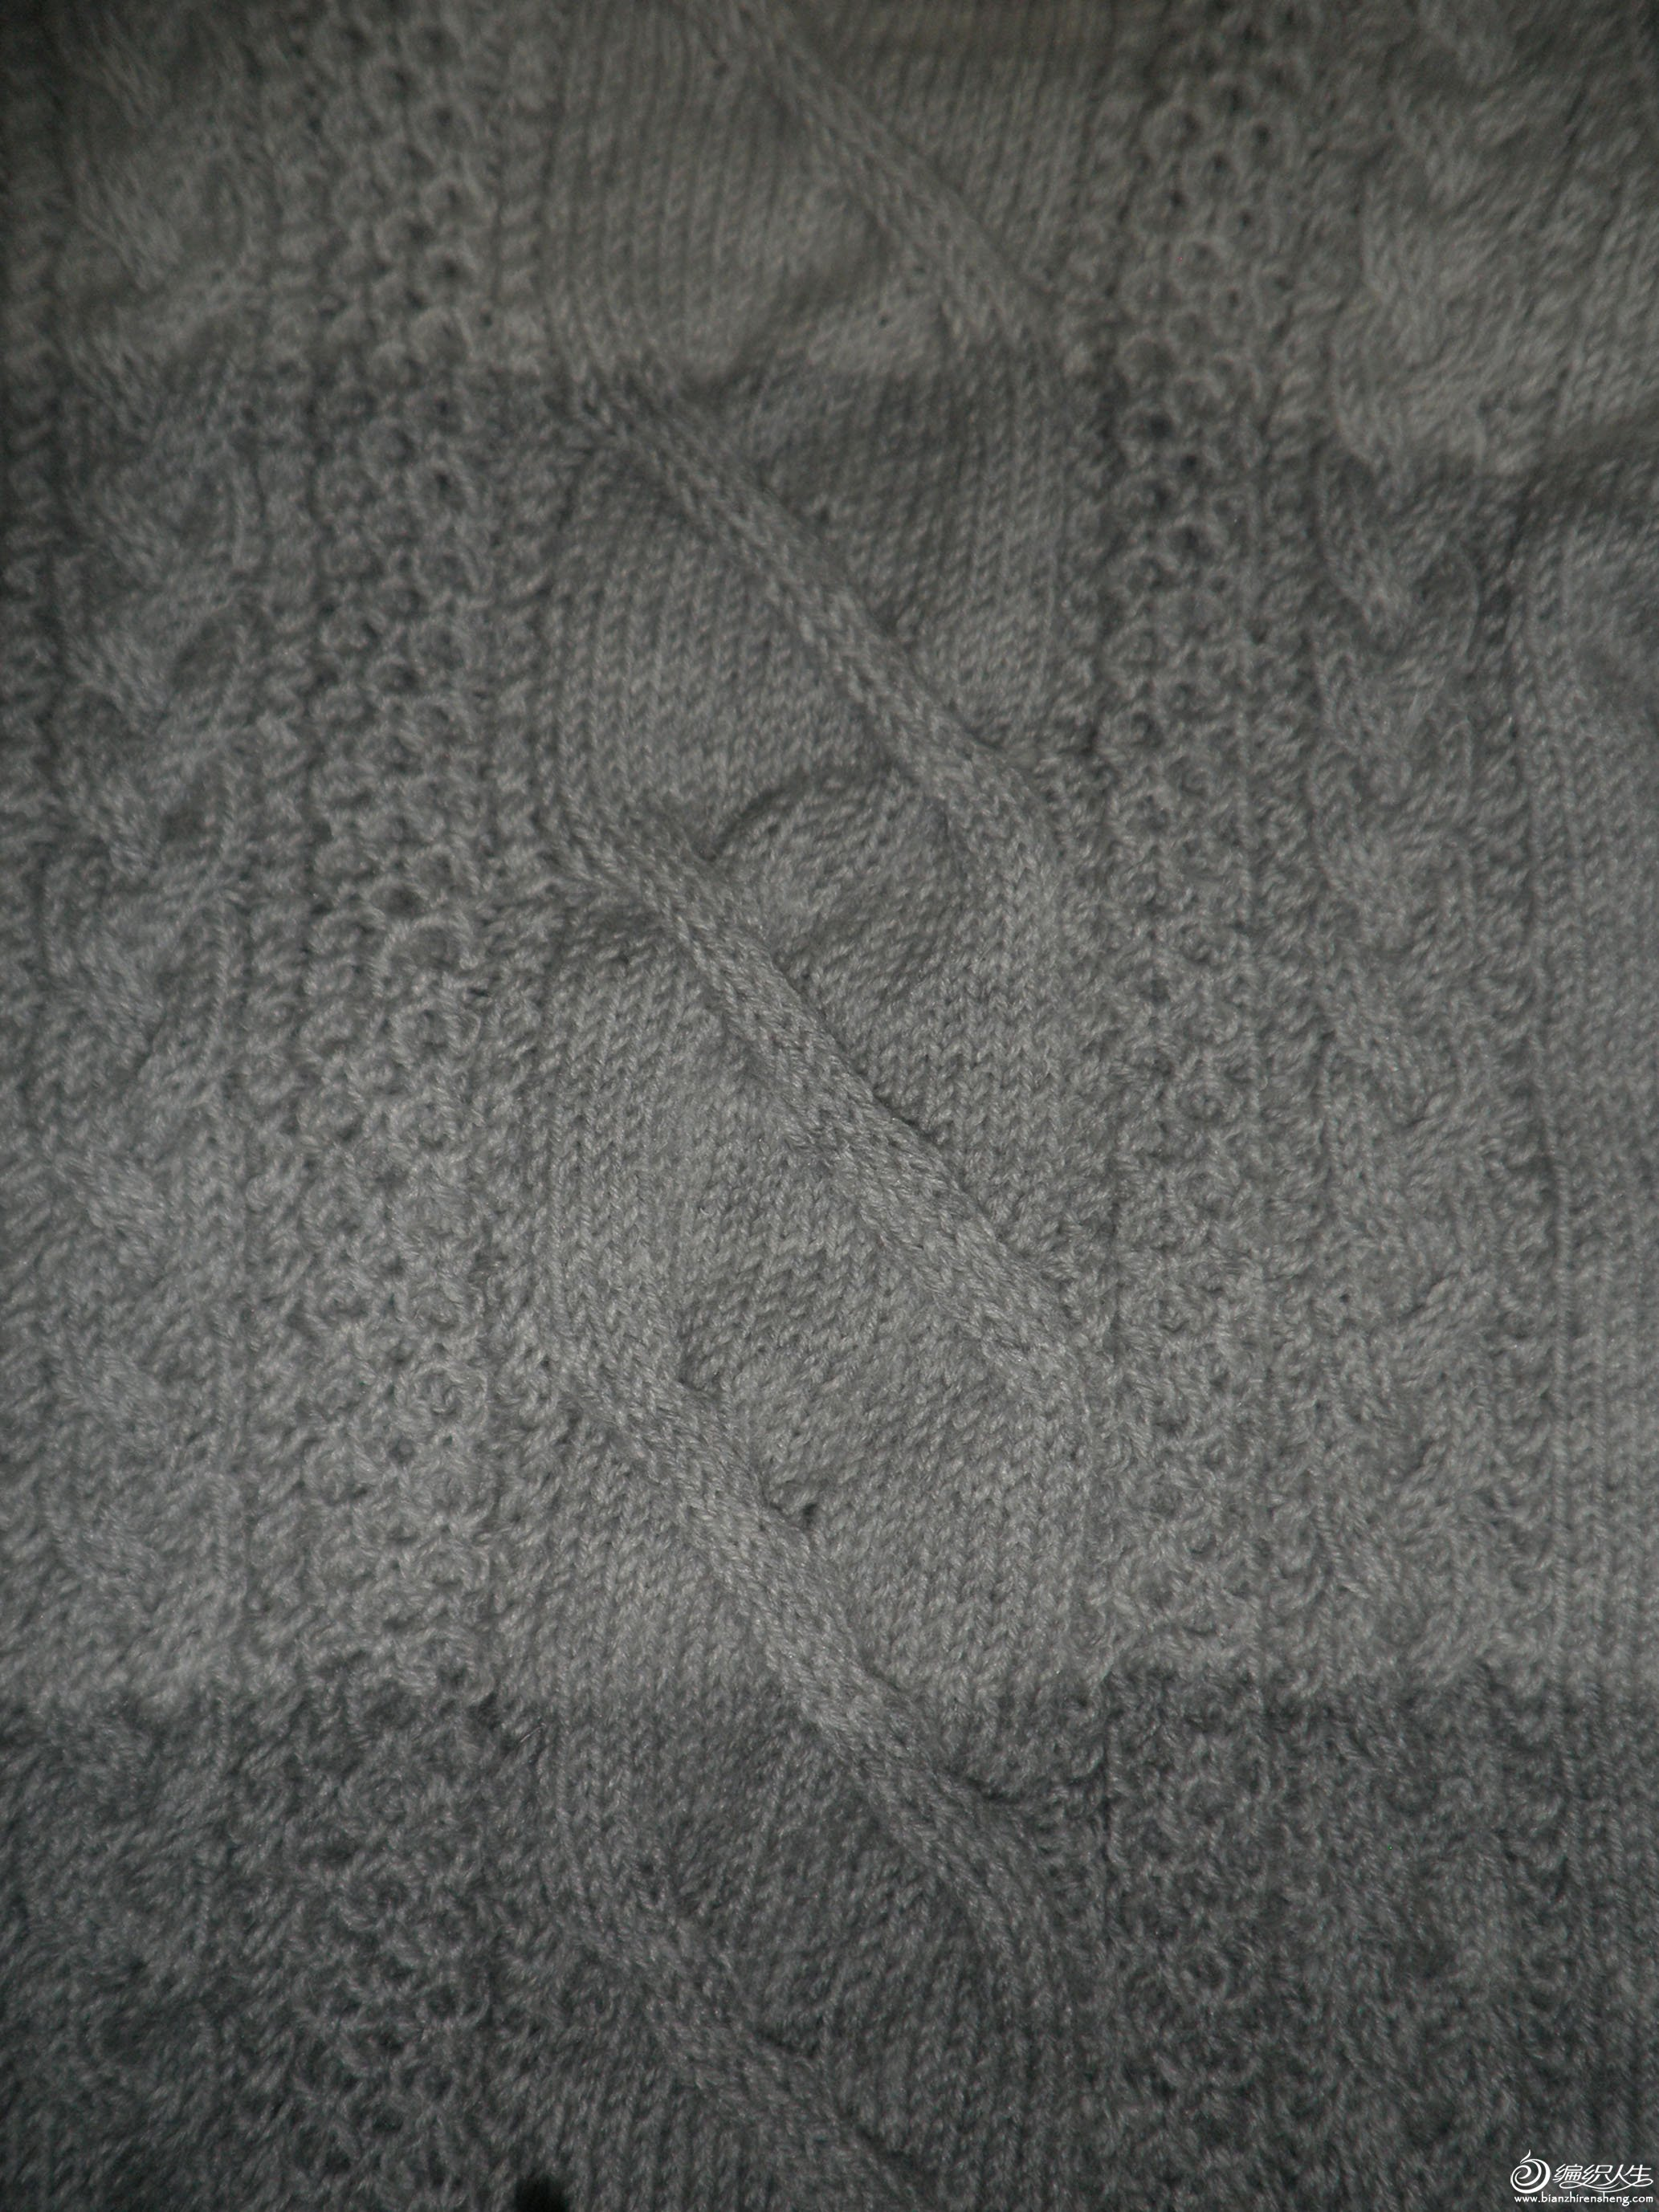 P1010021-1.jpg